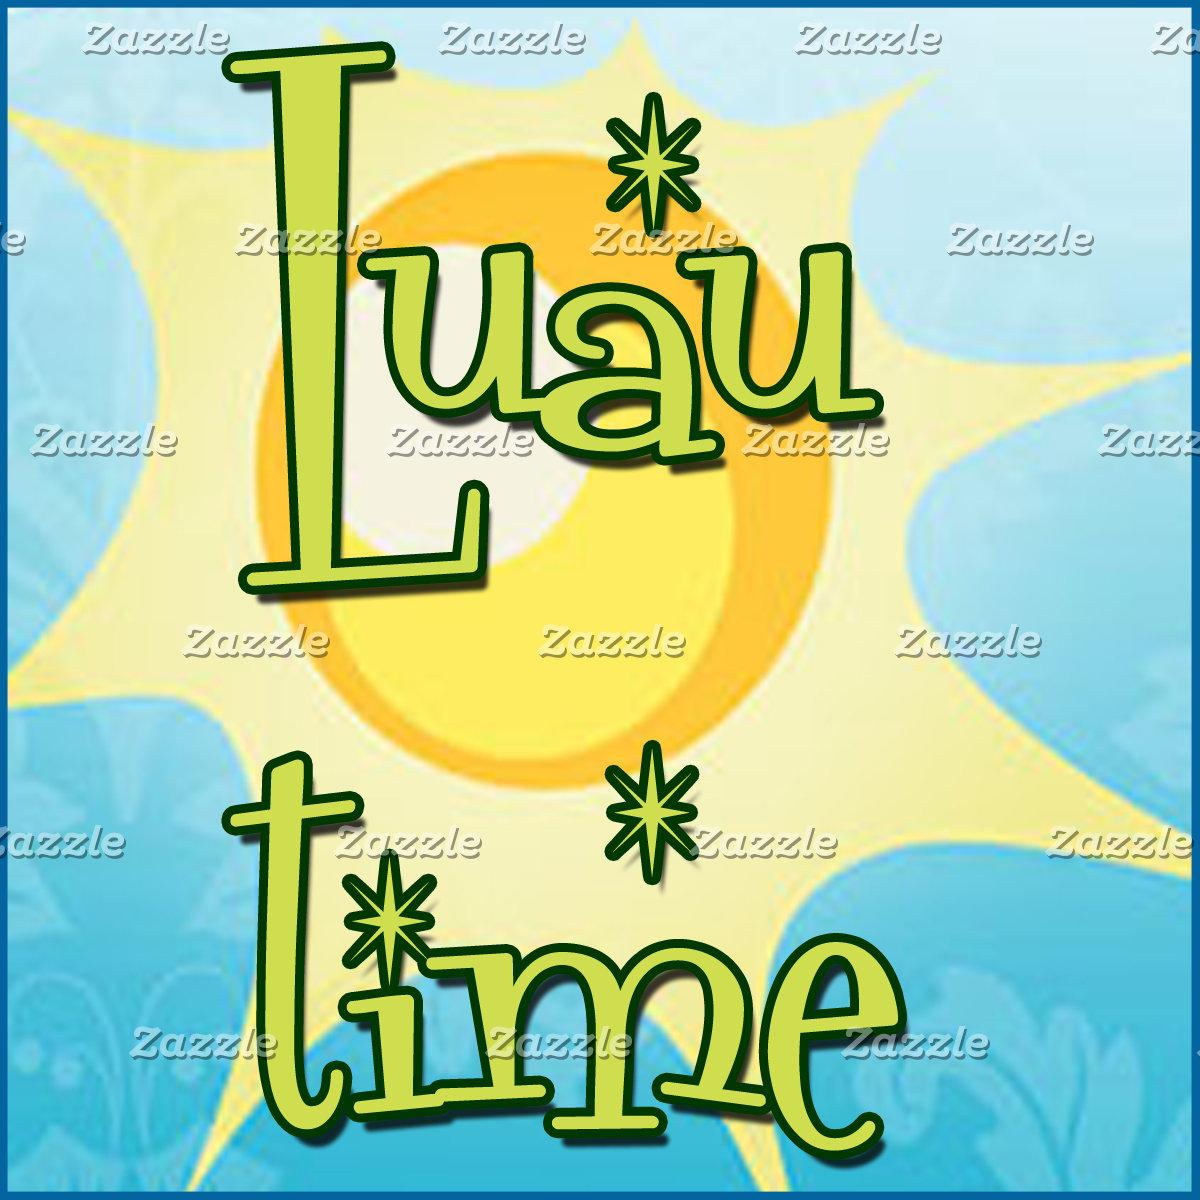 Luau Time